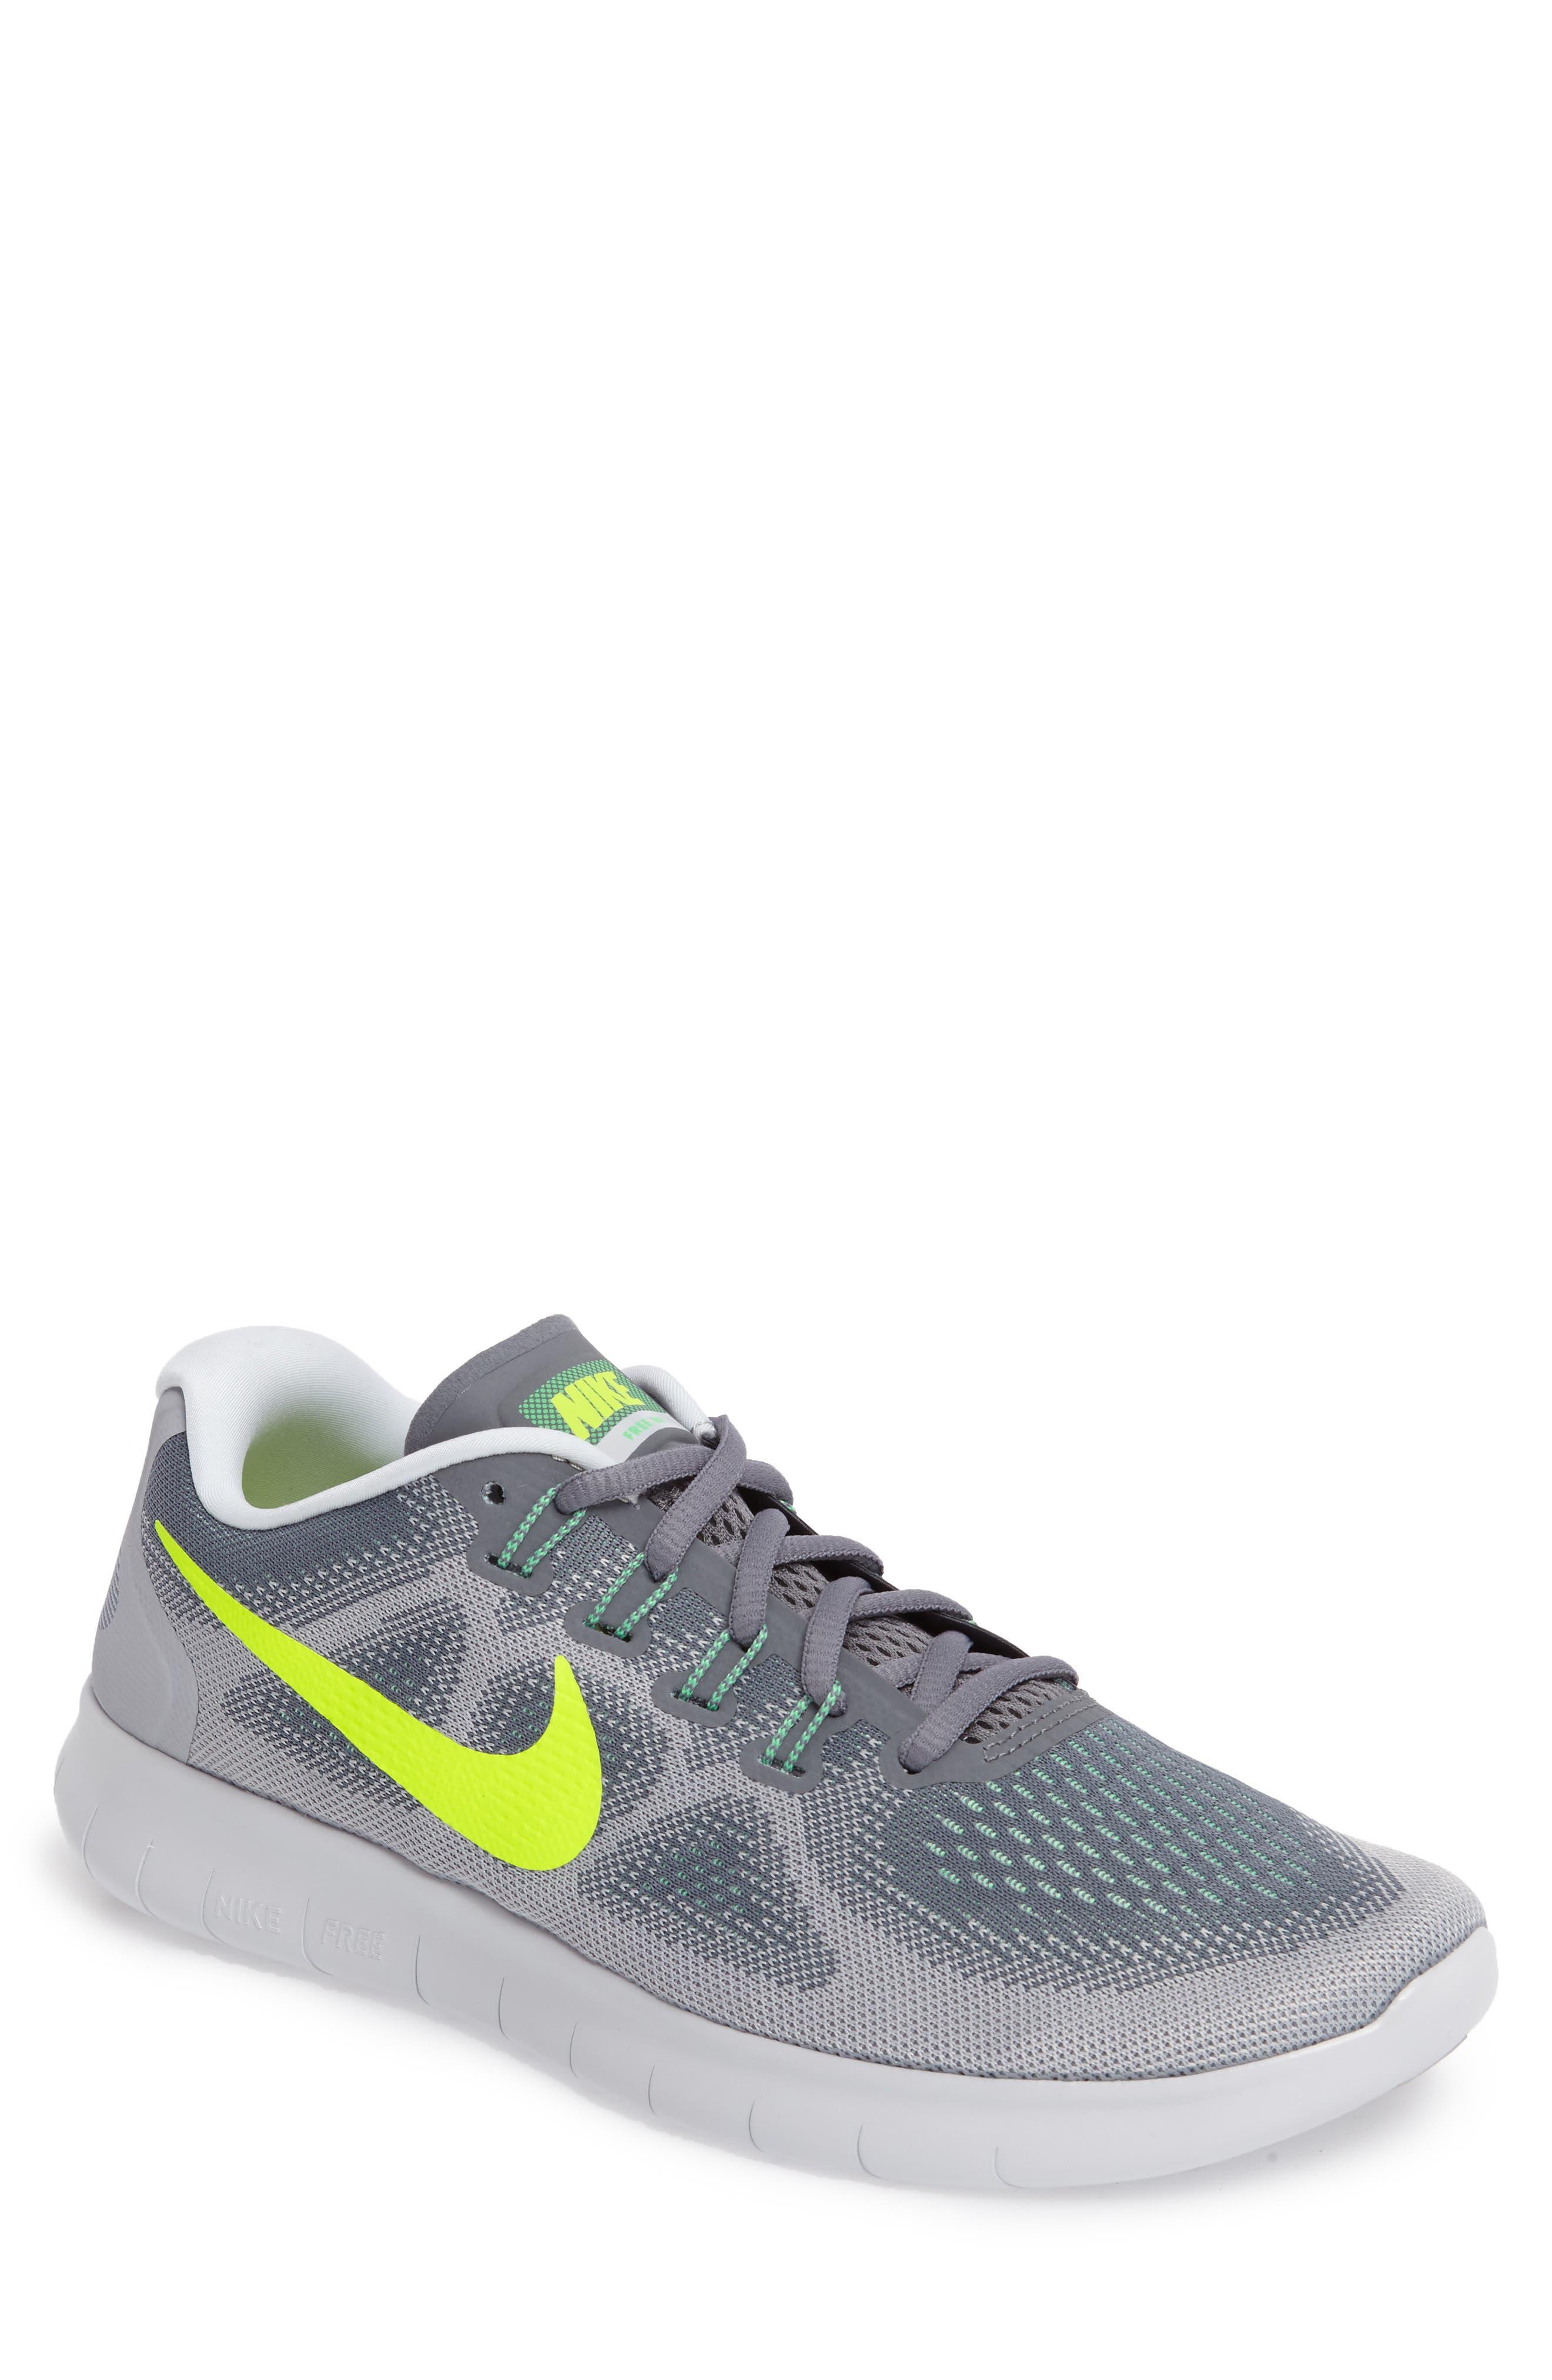 Free Run 2017 Running Shoe,                         Main,                         color, Grey/ Volt/ Grey/ Green